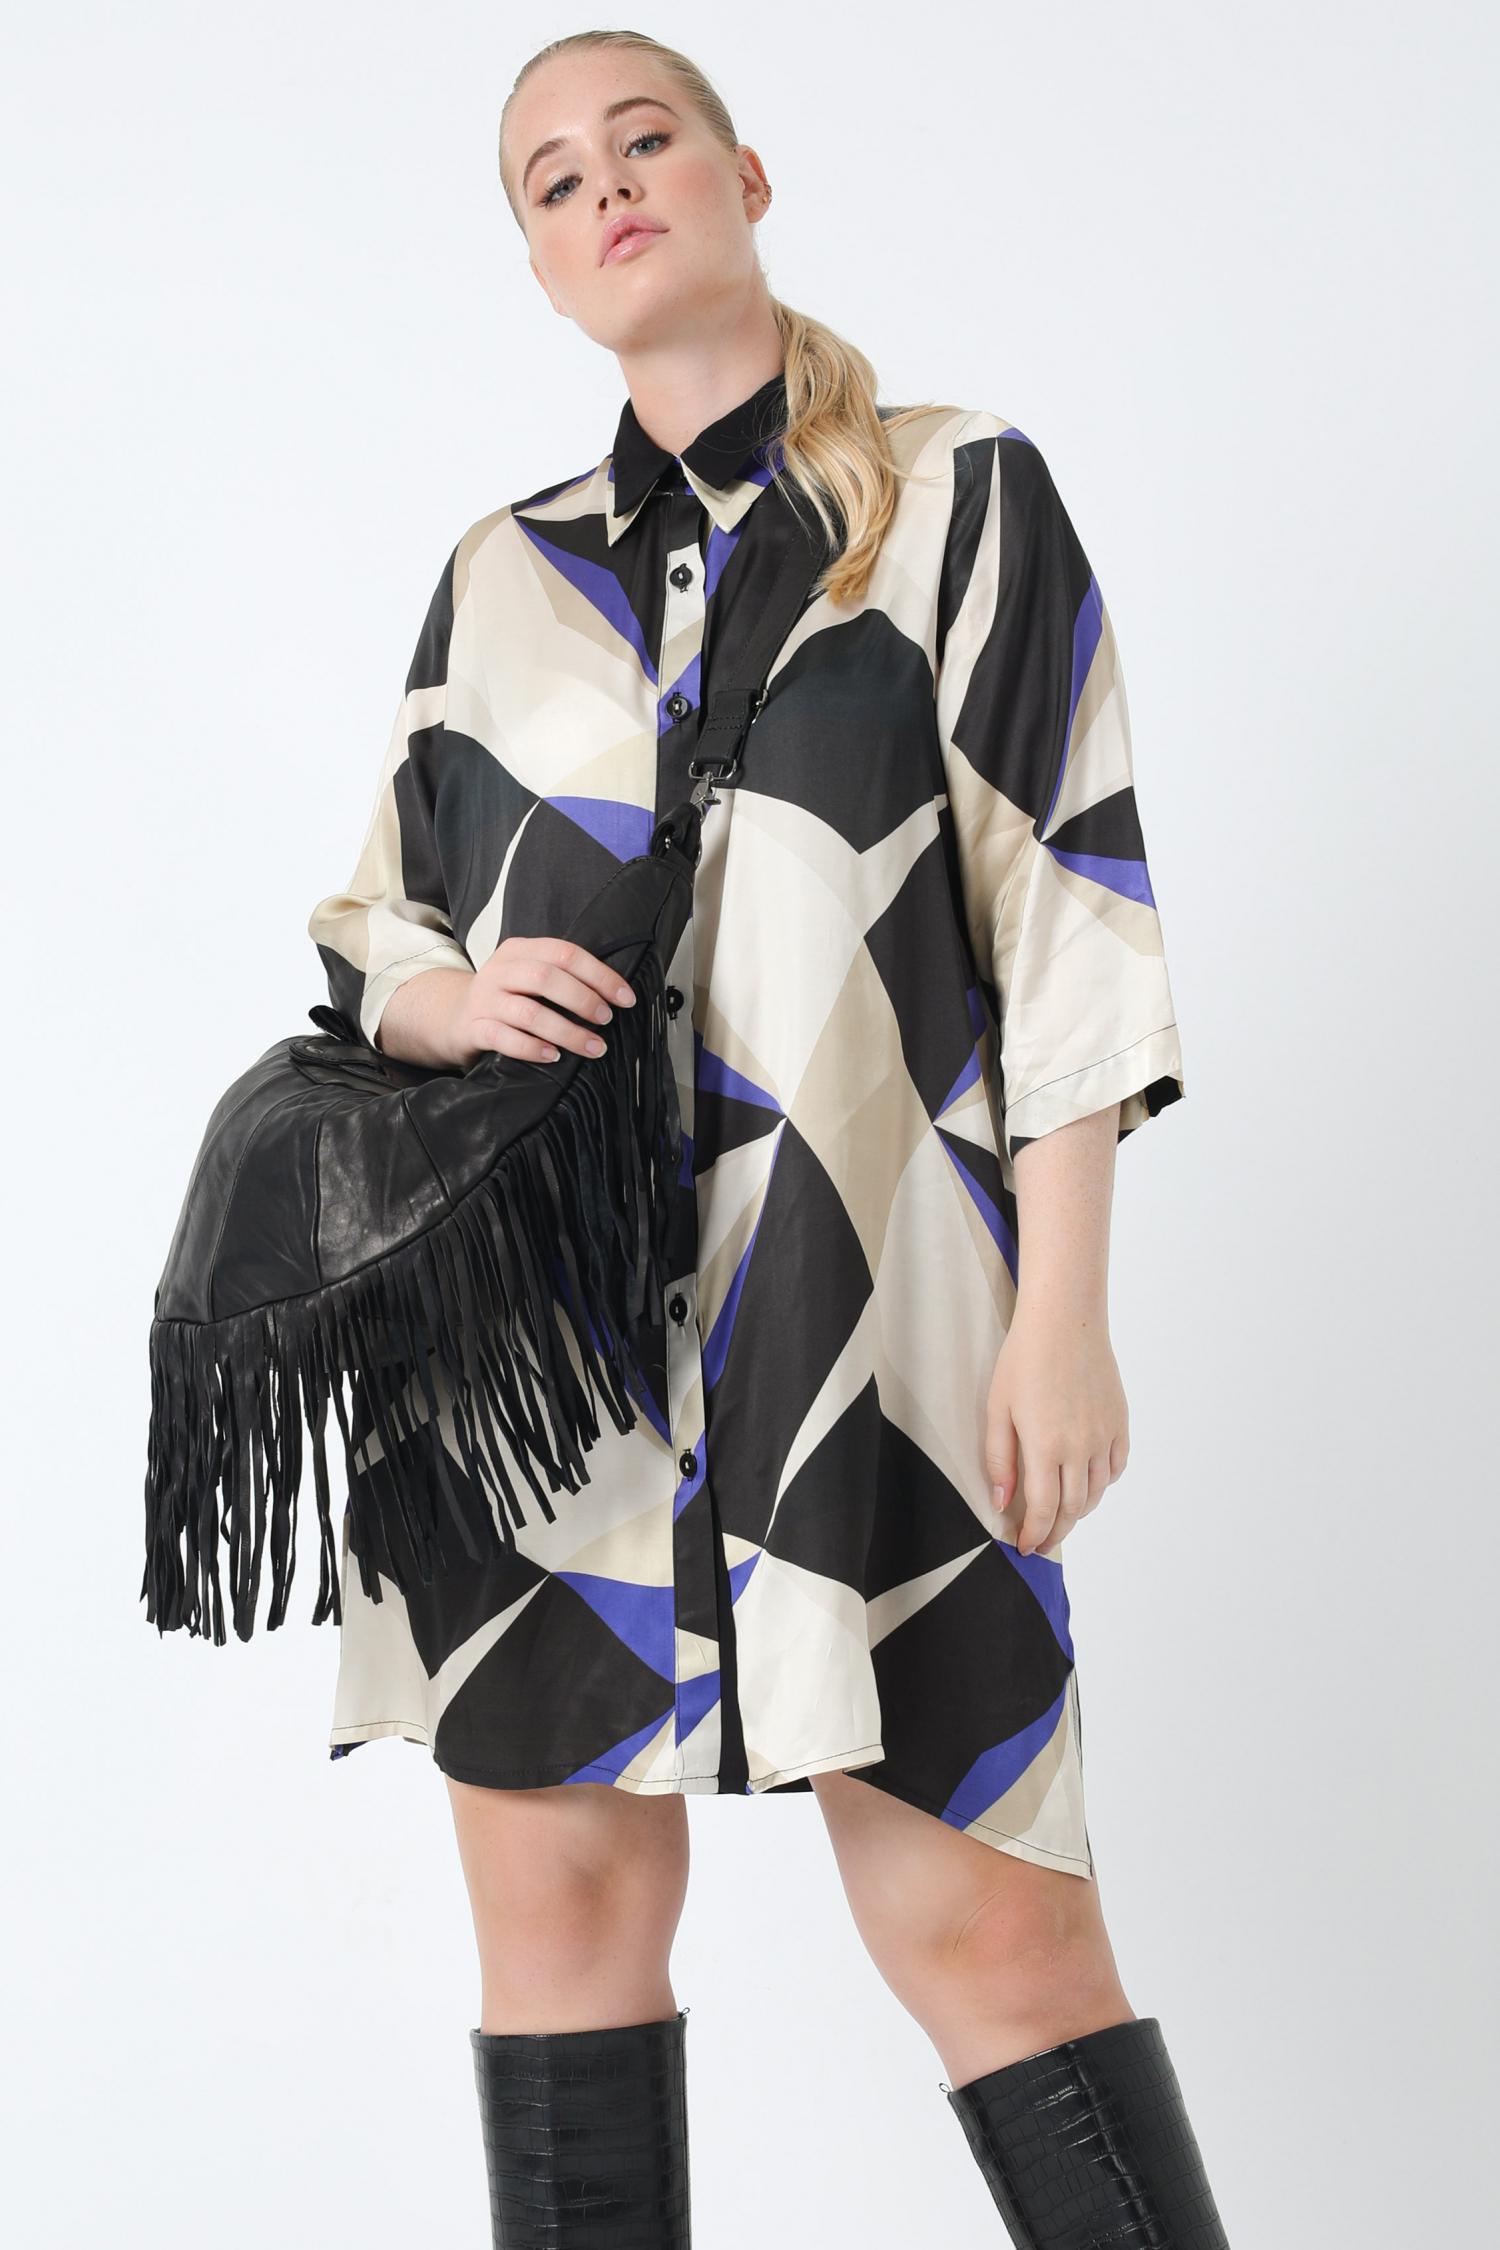 Oeko-tex printed satin shirt dress (shipping September 25/30)